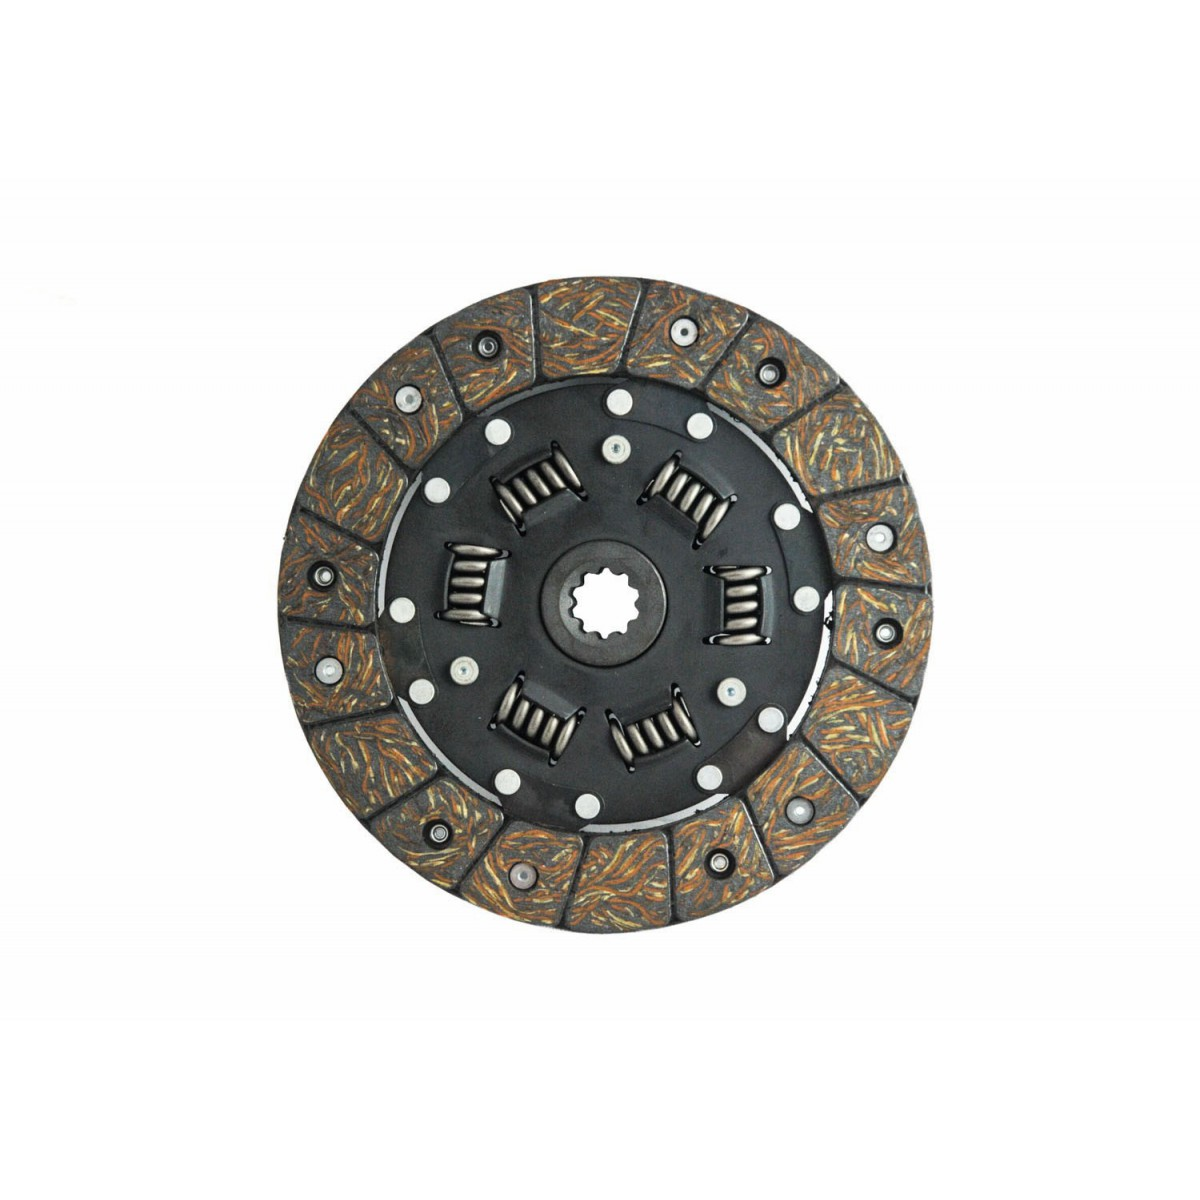 "Clutch Disc Yanmar F14 7 1/4"" 10T"